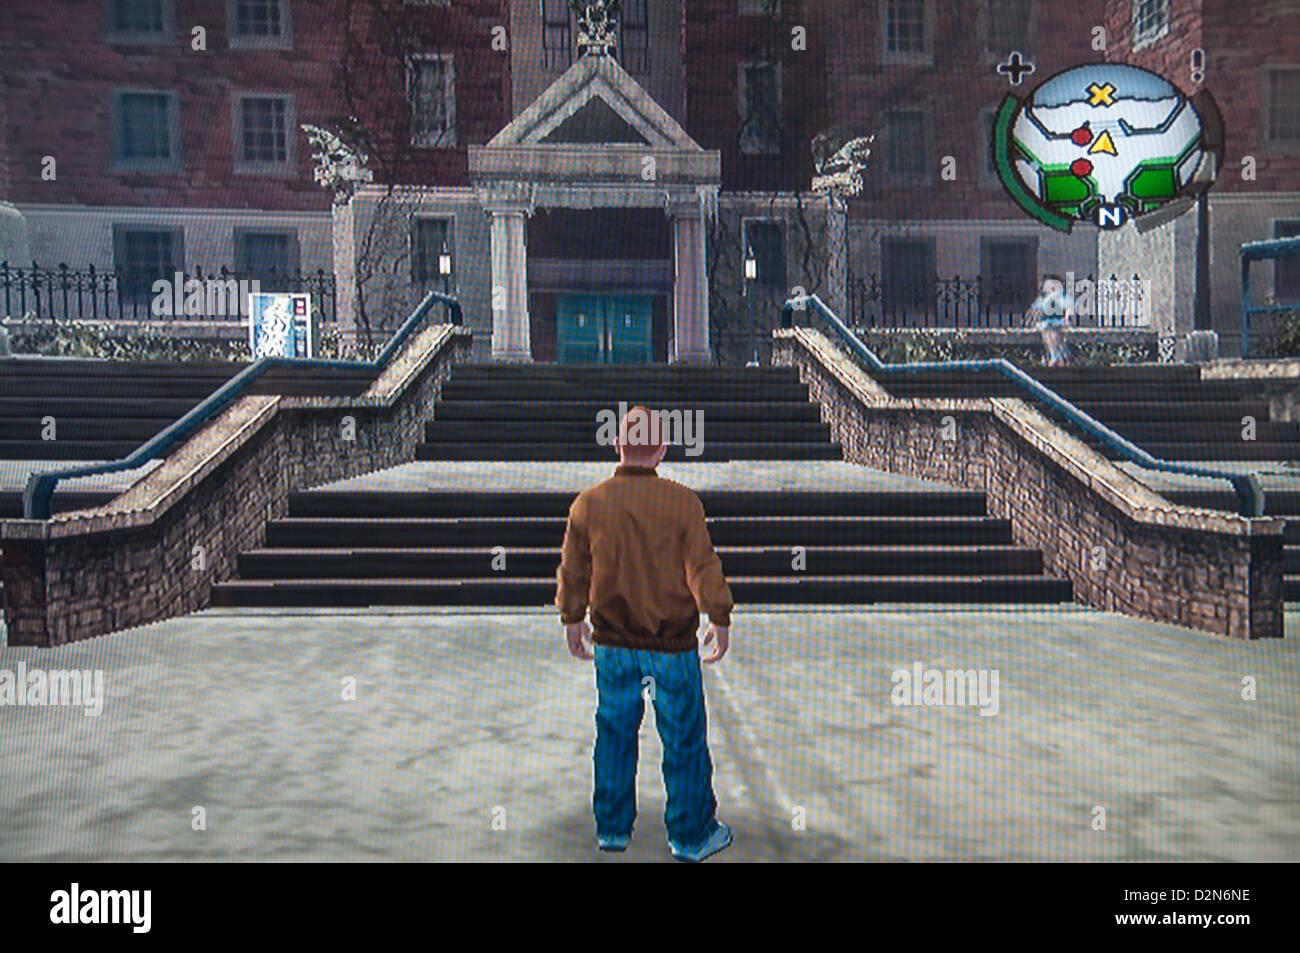 Grand Theft Auto video game Imagen De Stock